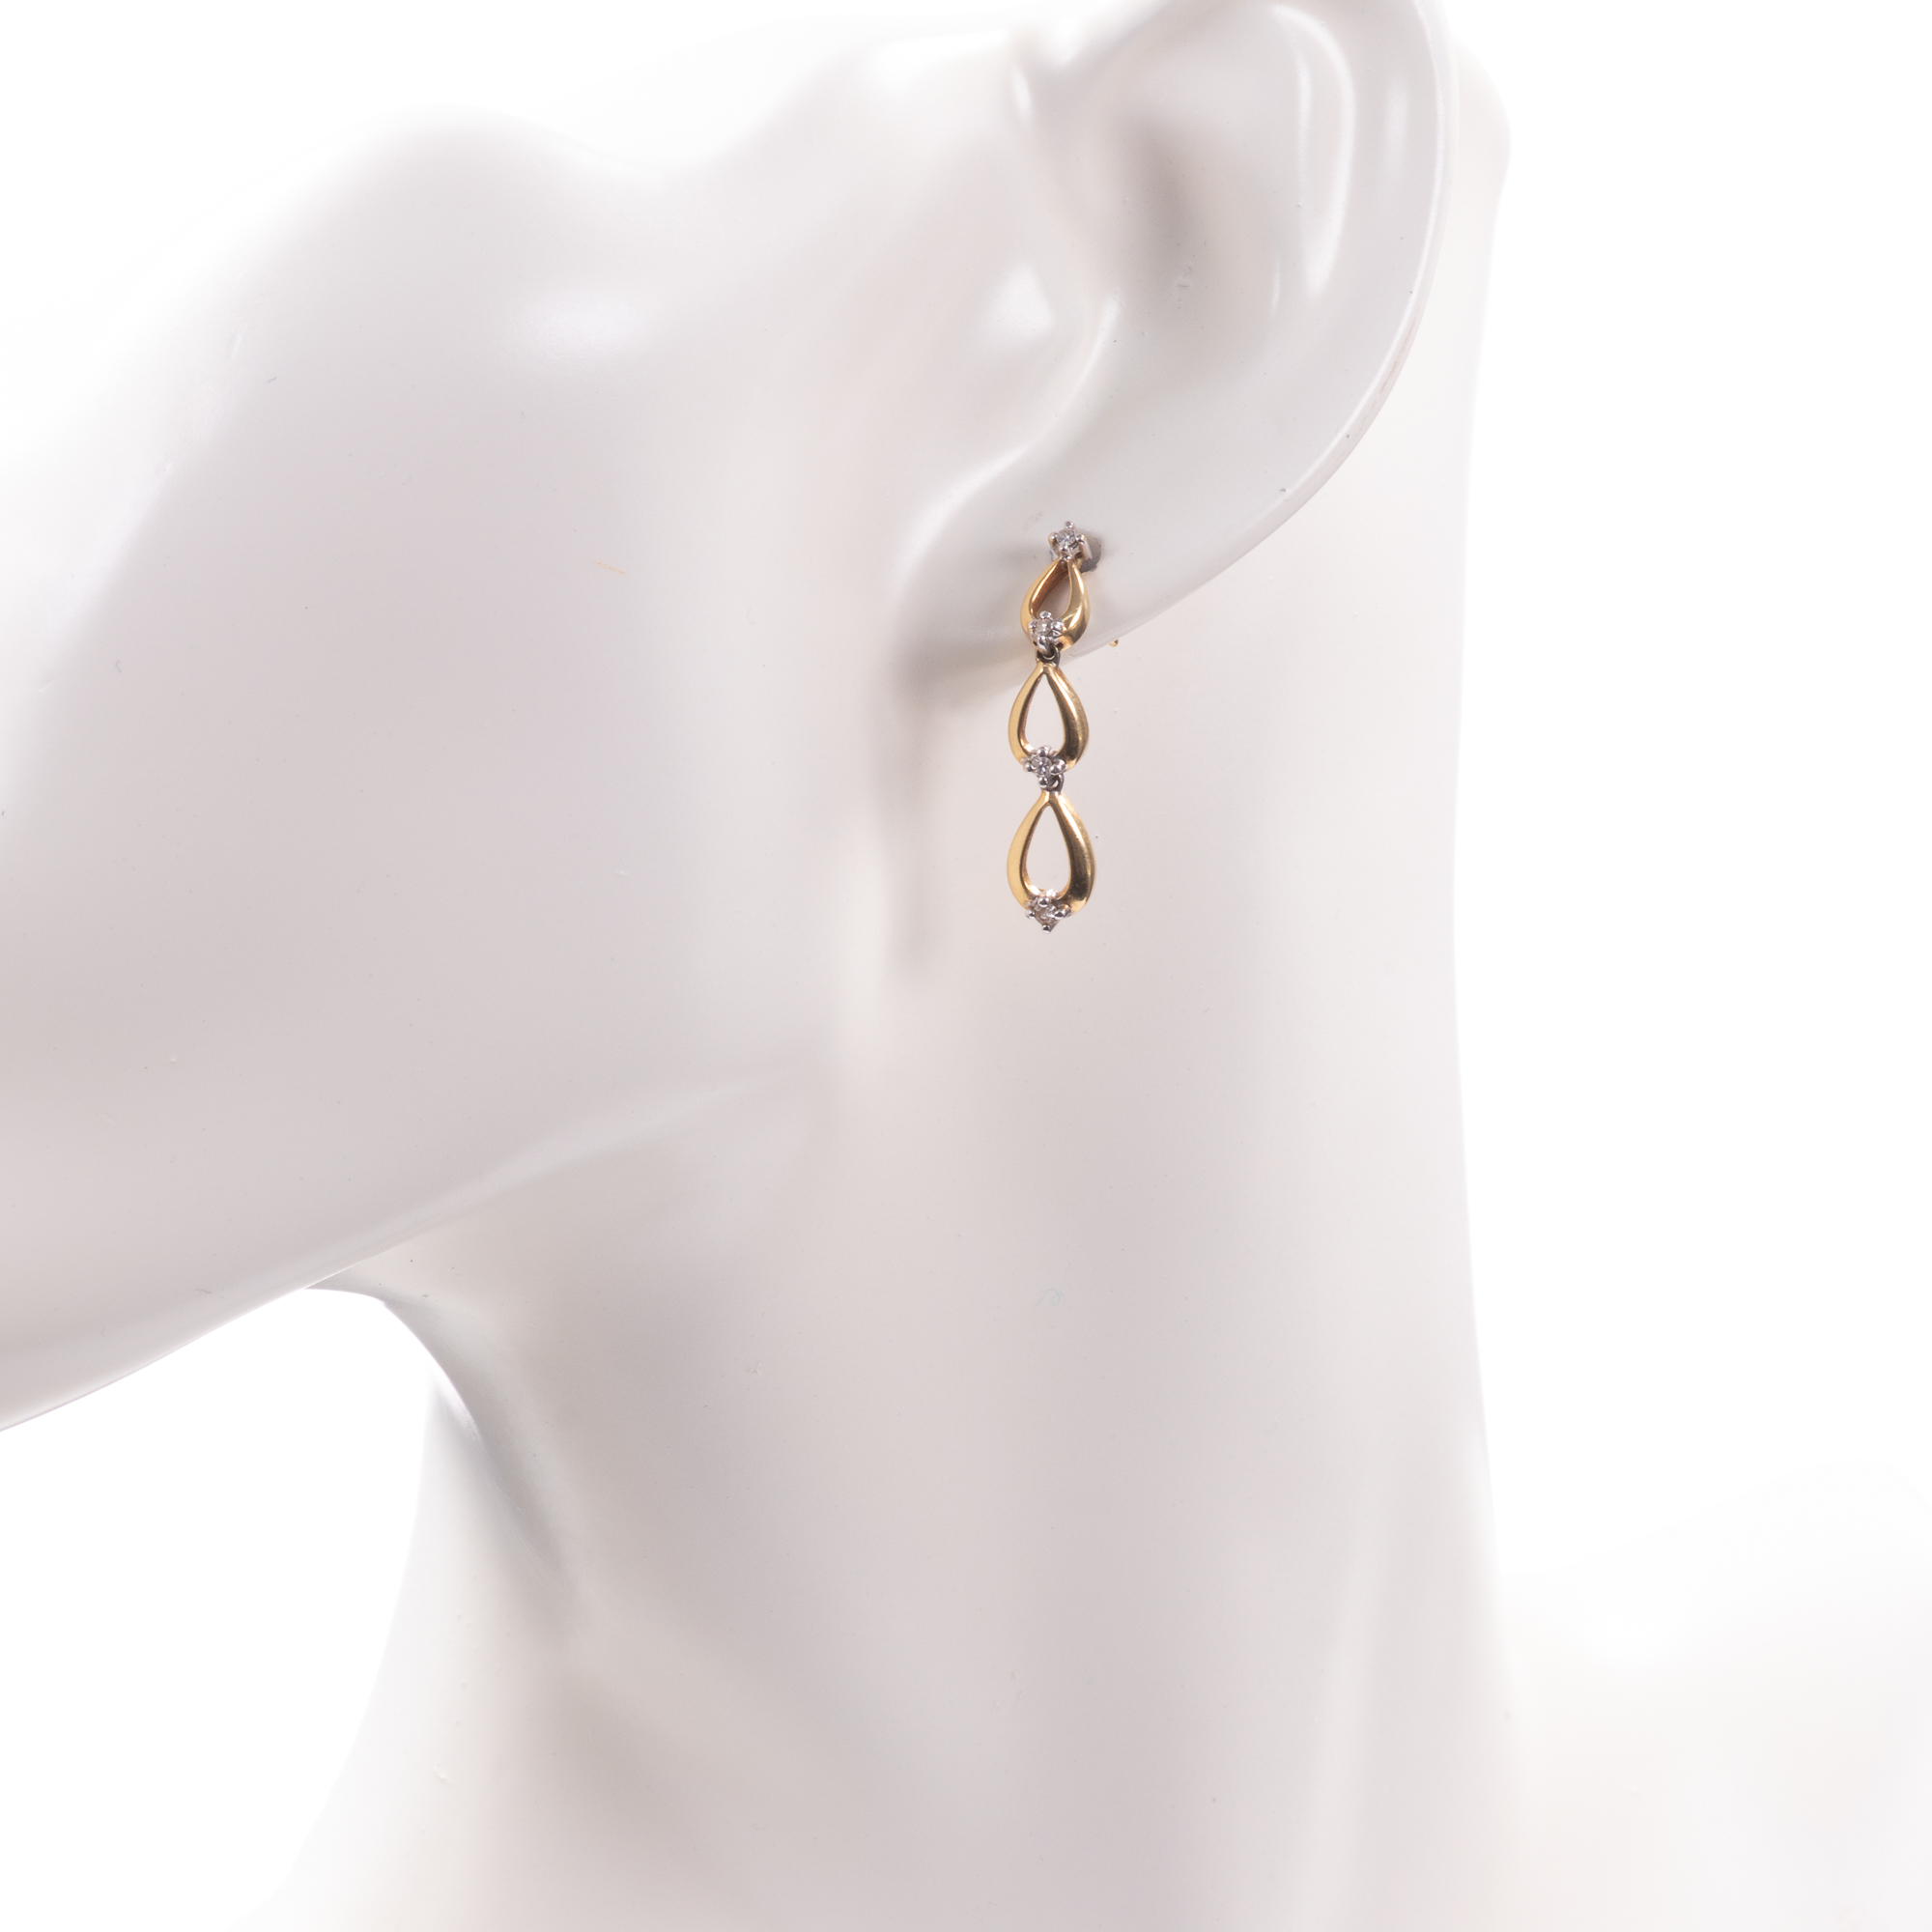 18ct Gold Diamond Earrings - Image 2 of 6